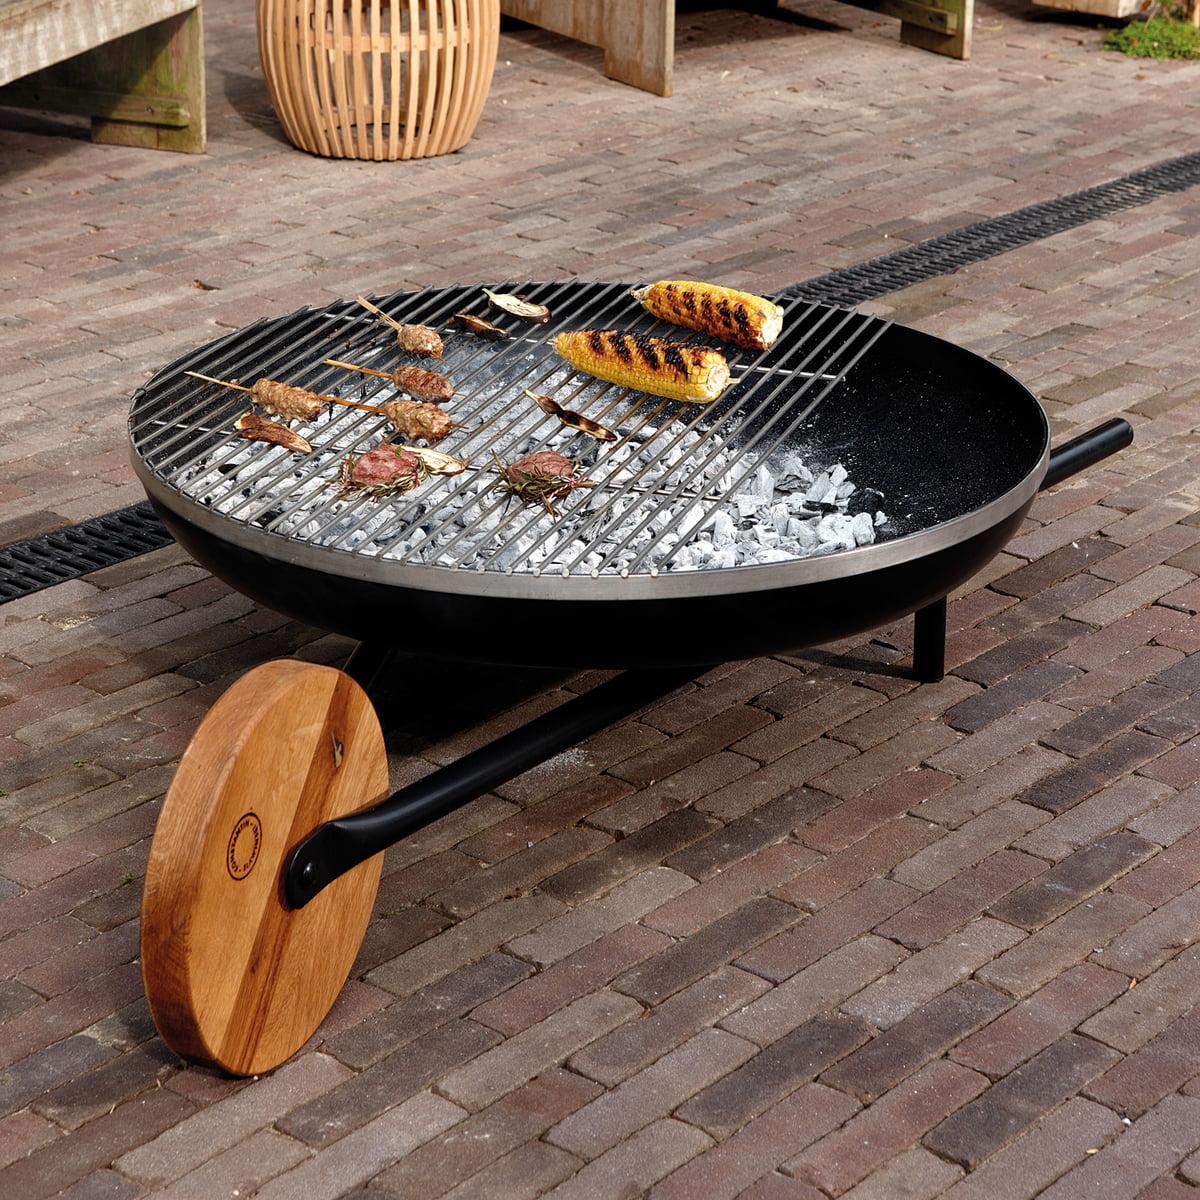 barrow feuerschale mit grillfunktion von konstantin slawinski. Black Bedroom Furniture Sets. Home Design Ideas